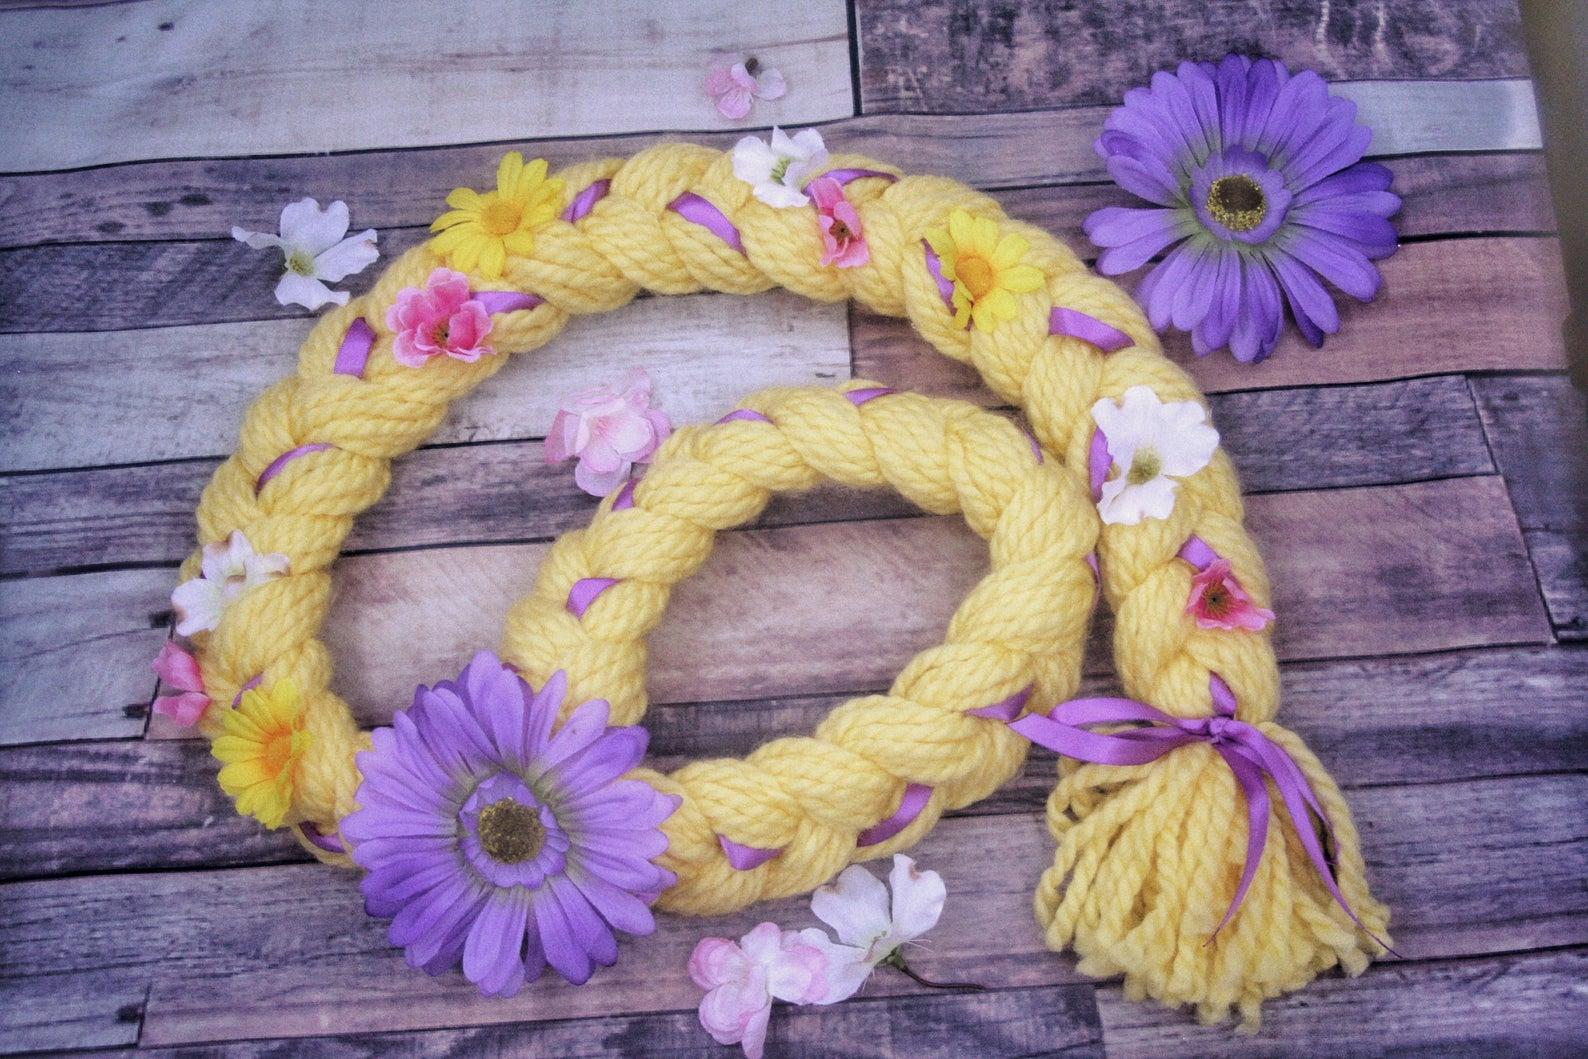 Etsy - Handmade Rapunzel Braid